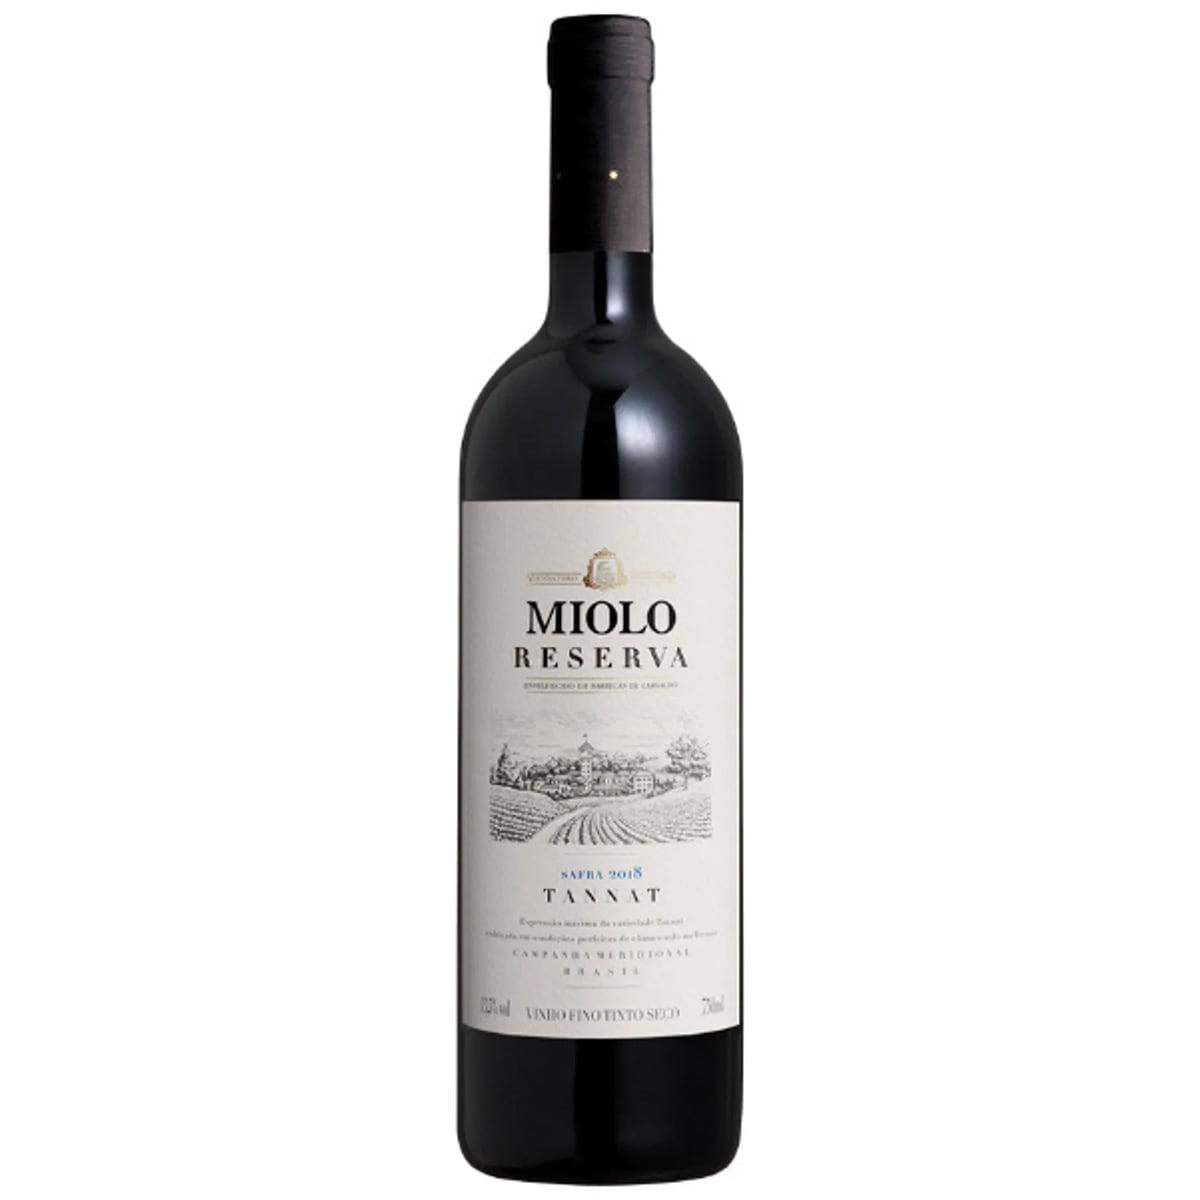 Vinho Miolo Reserva Tannat Tinto Seco 750ml